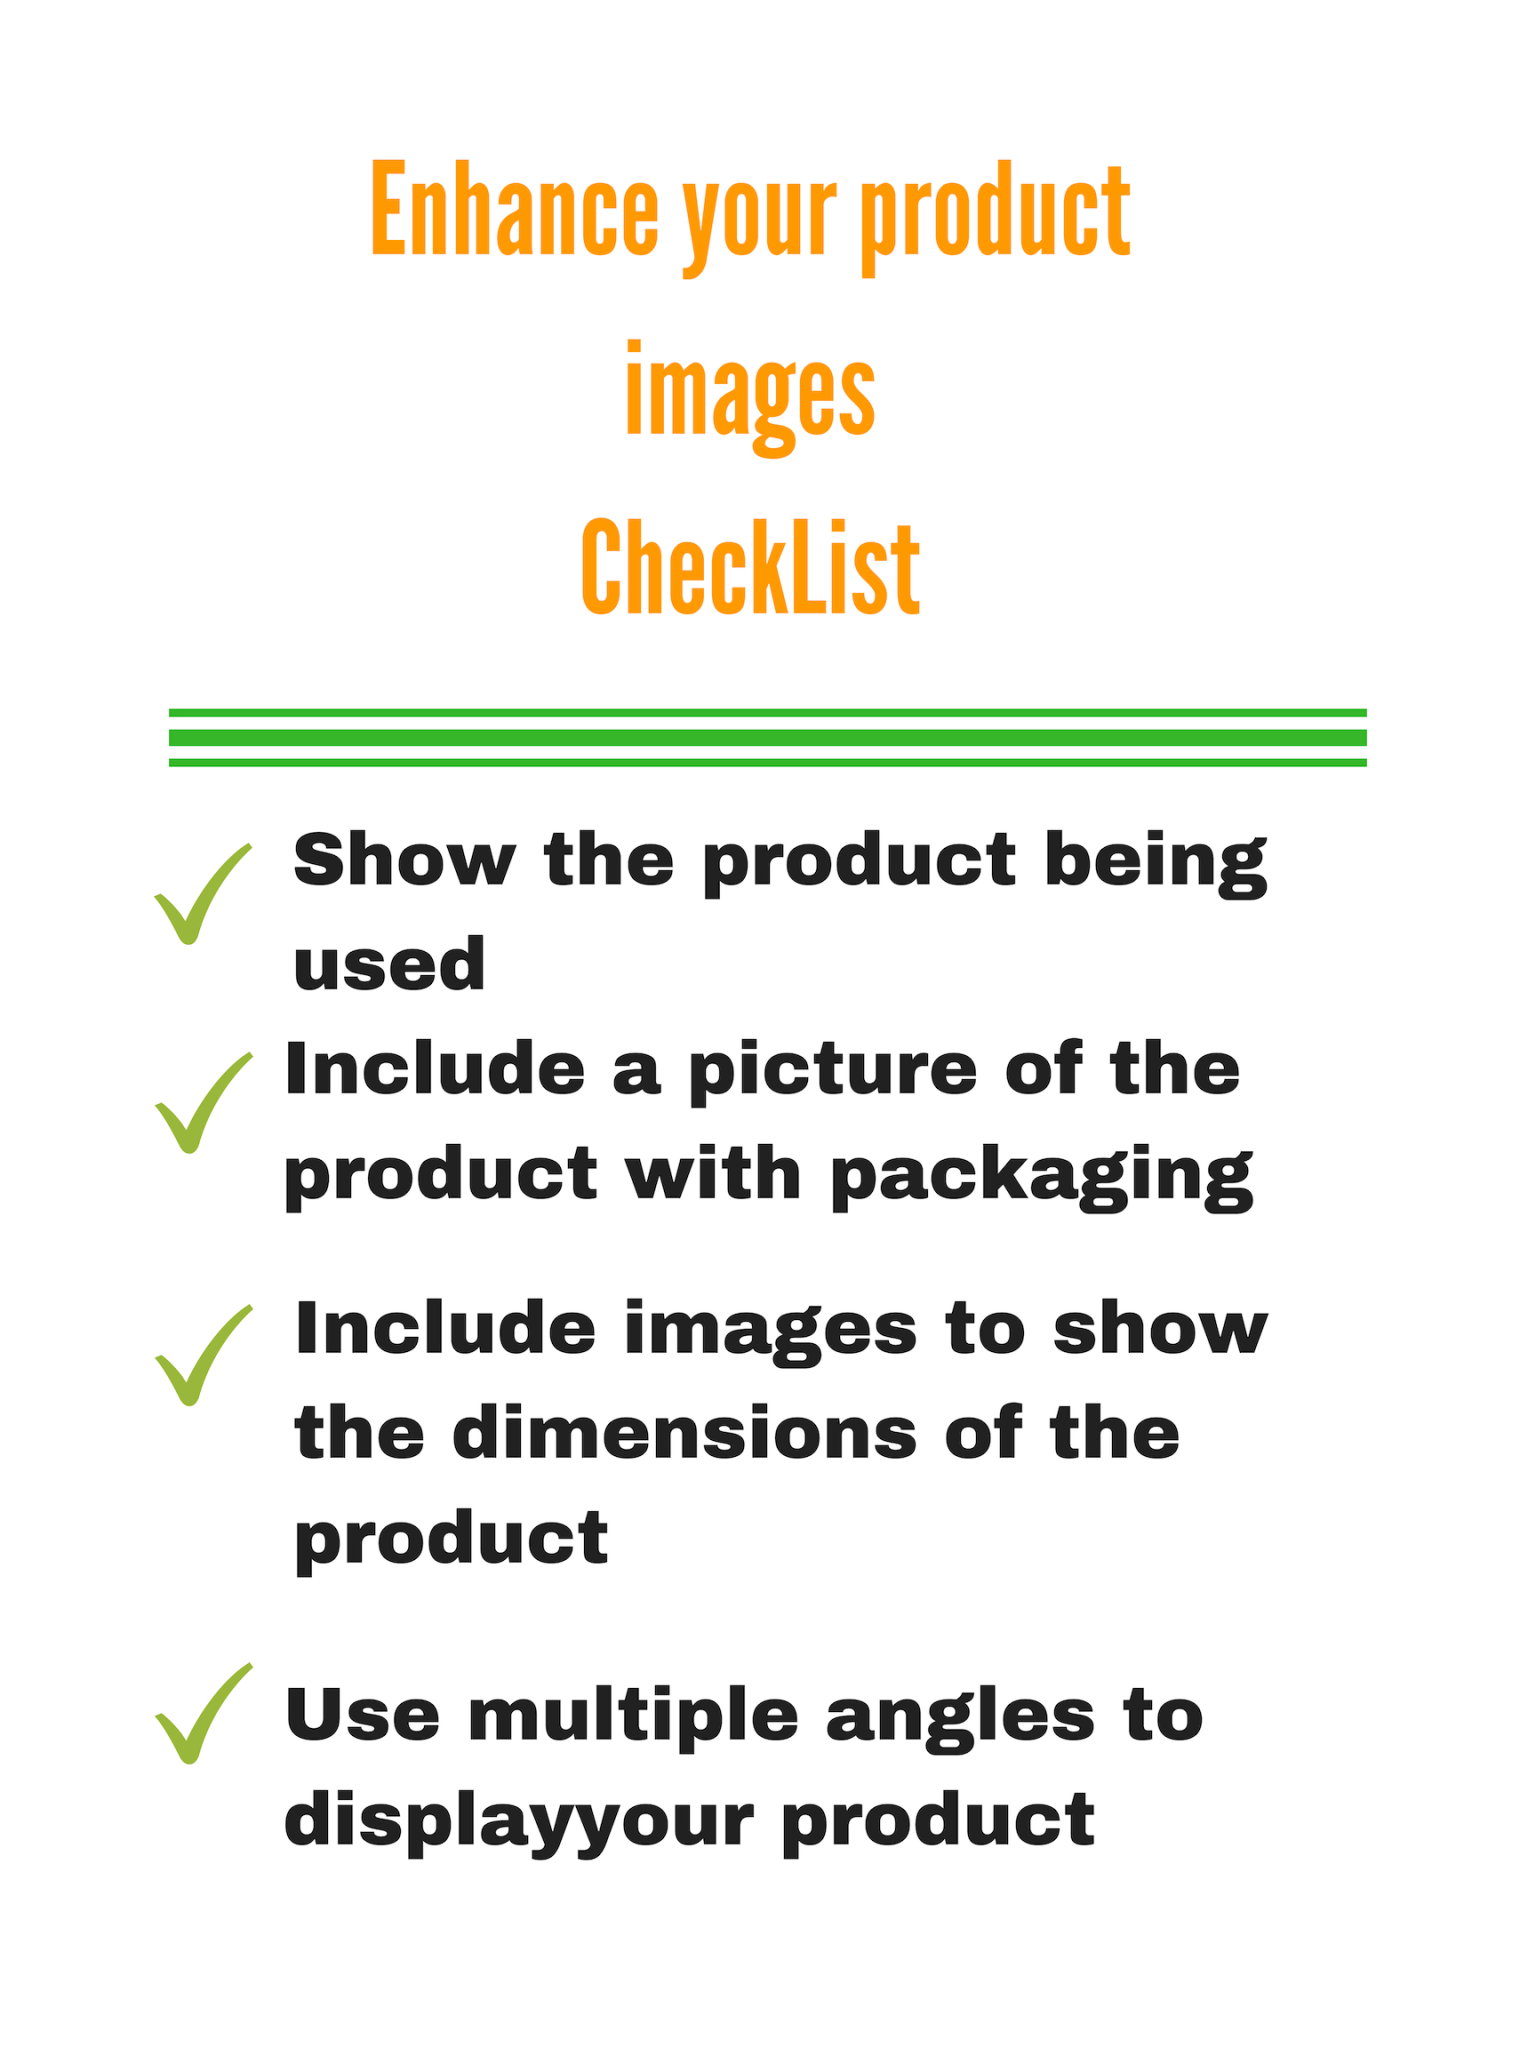 enchance_image_checklist